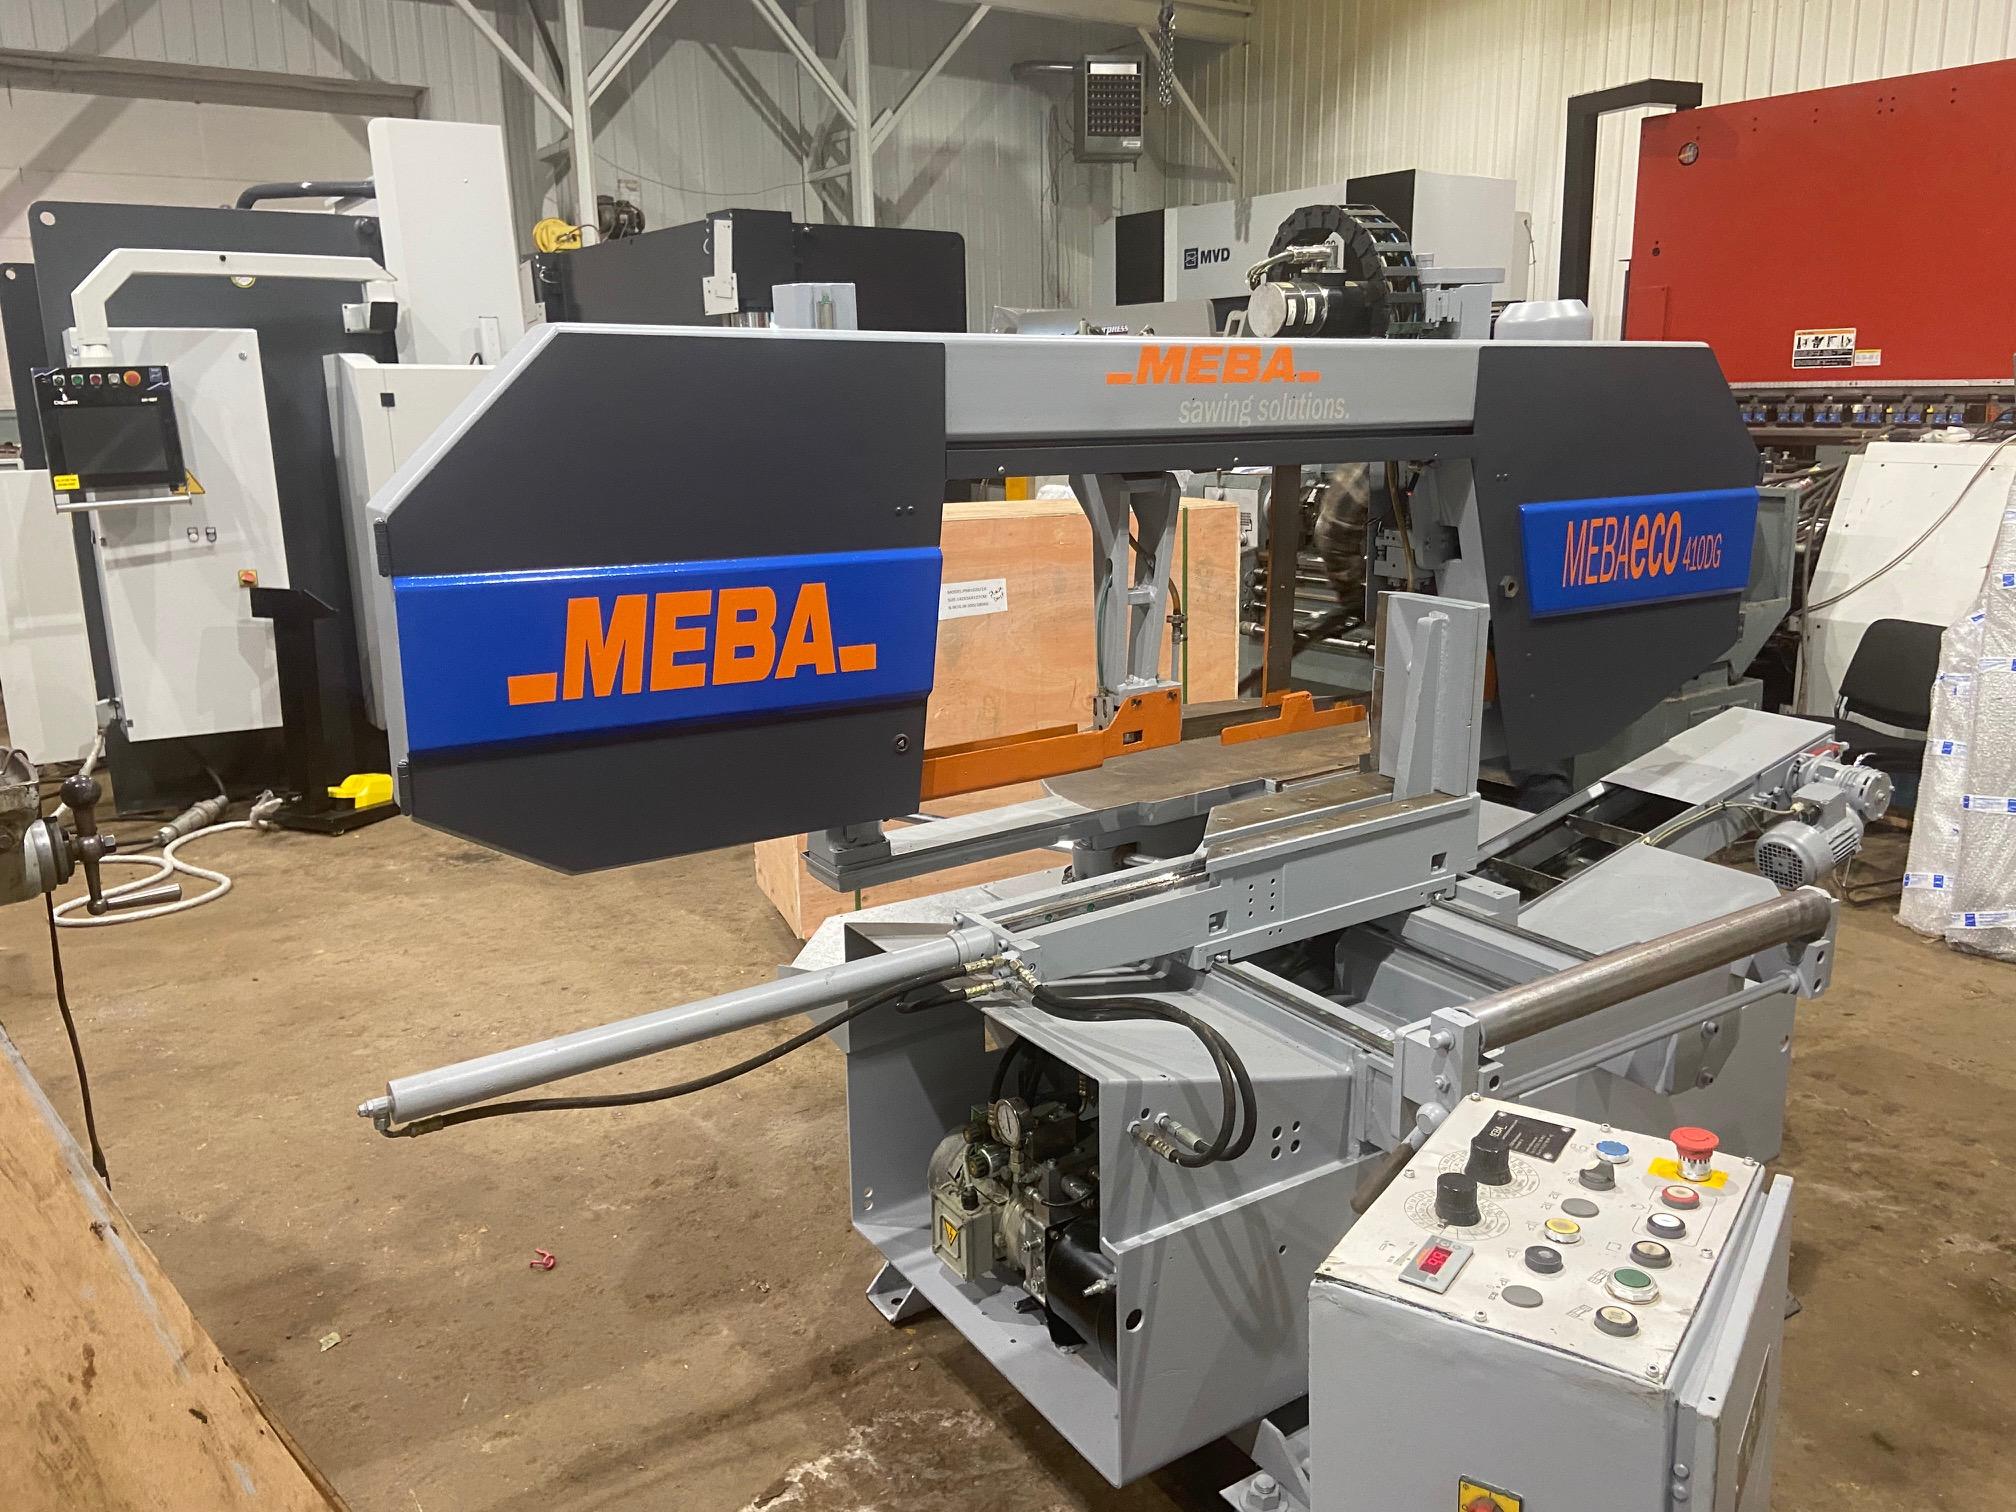 MEBA 410DG-700